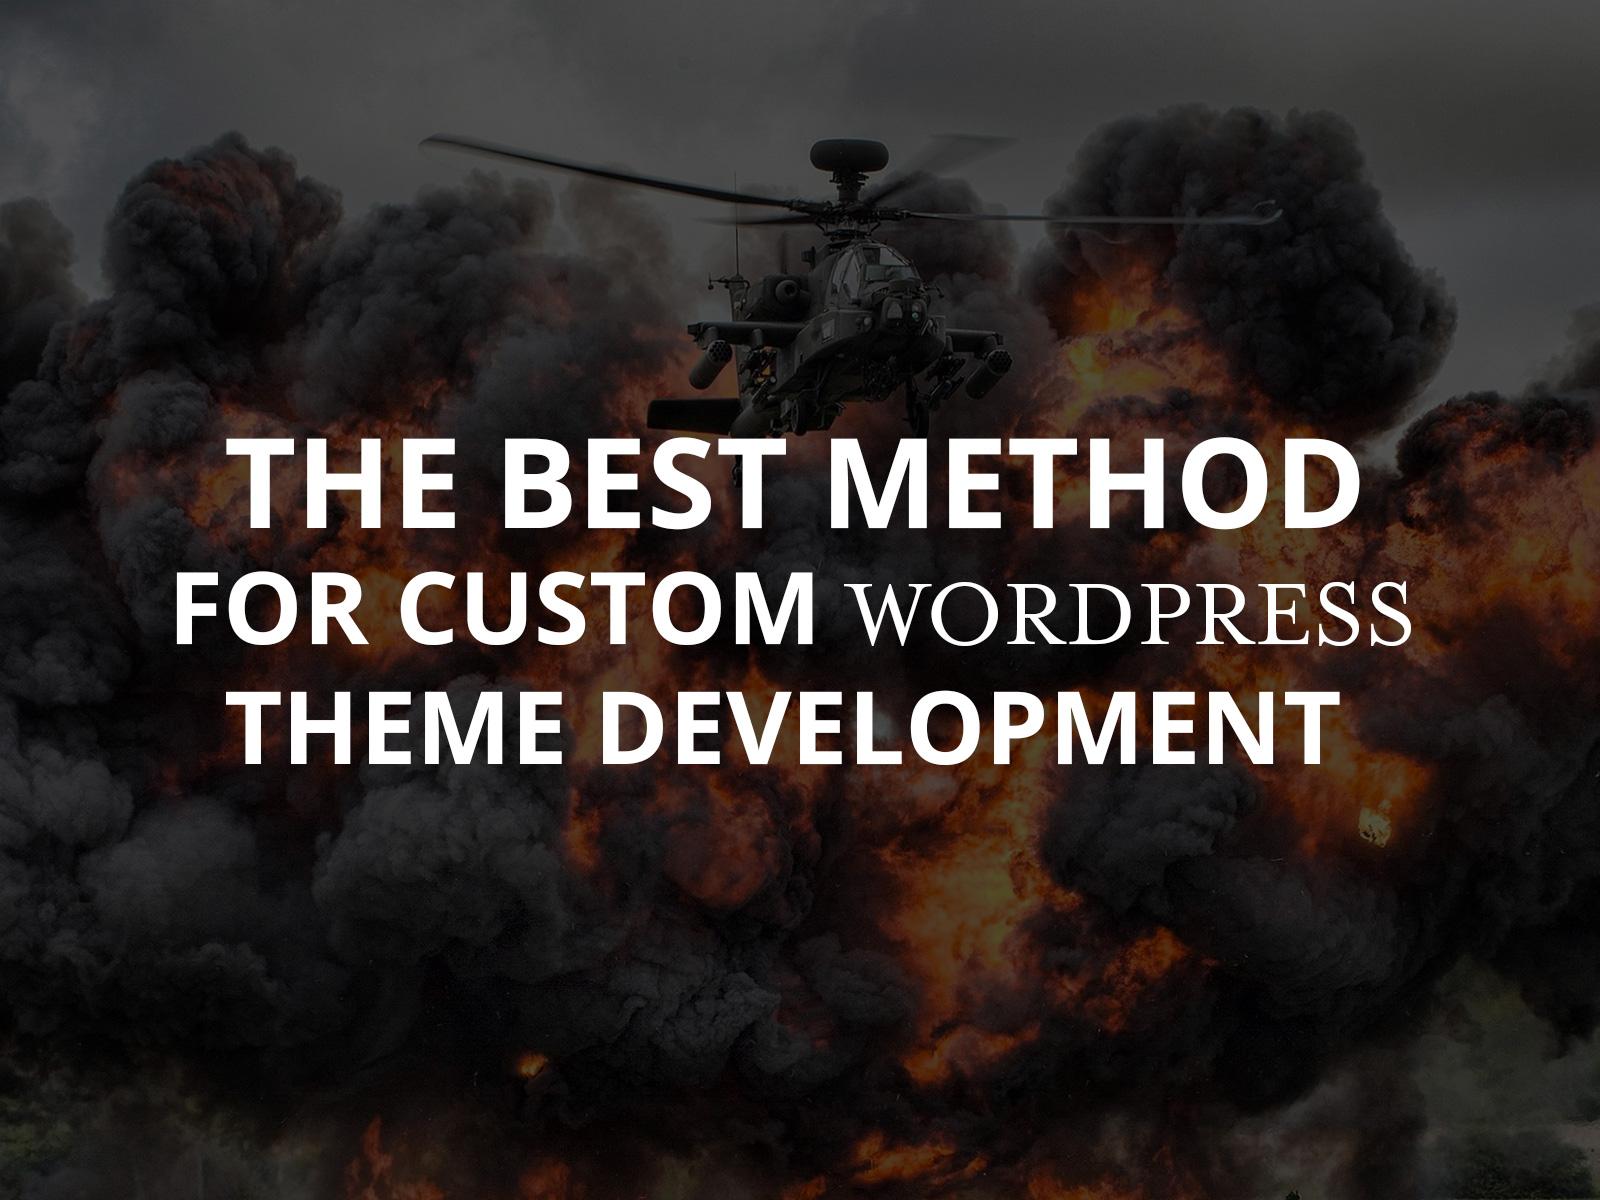 Best Method to Use for Custom WordPress Theme Development